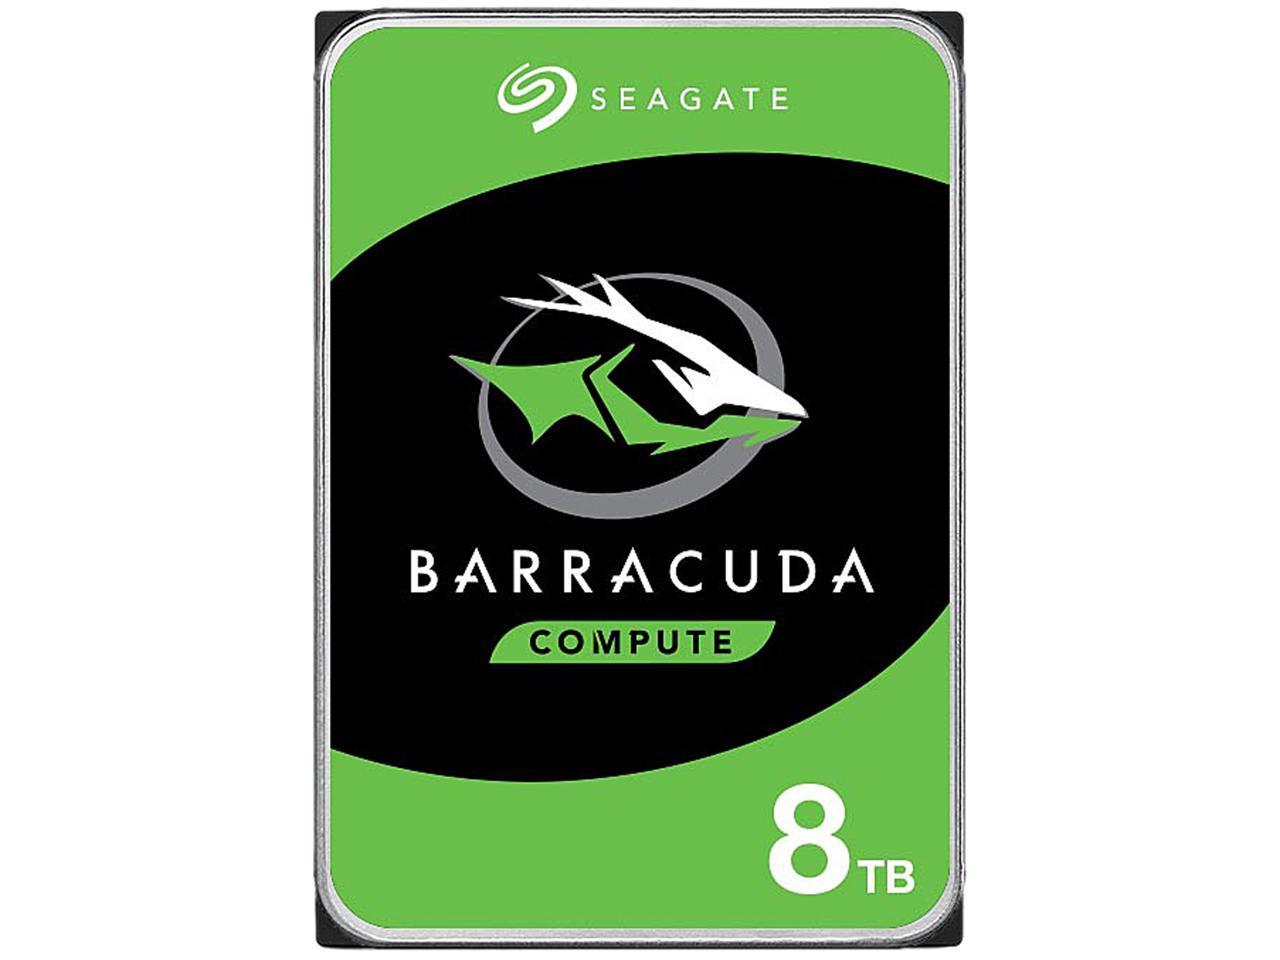 Seagate BarraCuda ST8000DM004 8TB Internal Hard Drive Bare Drive $150